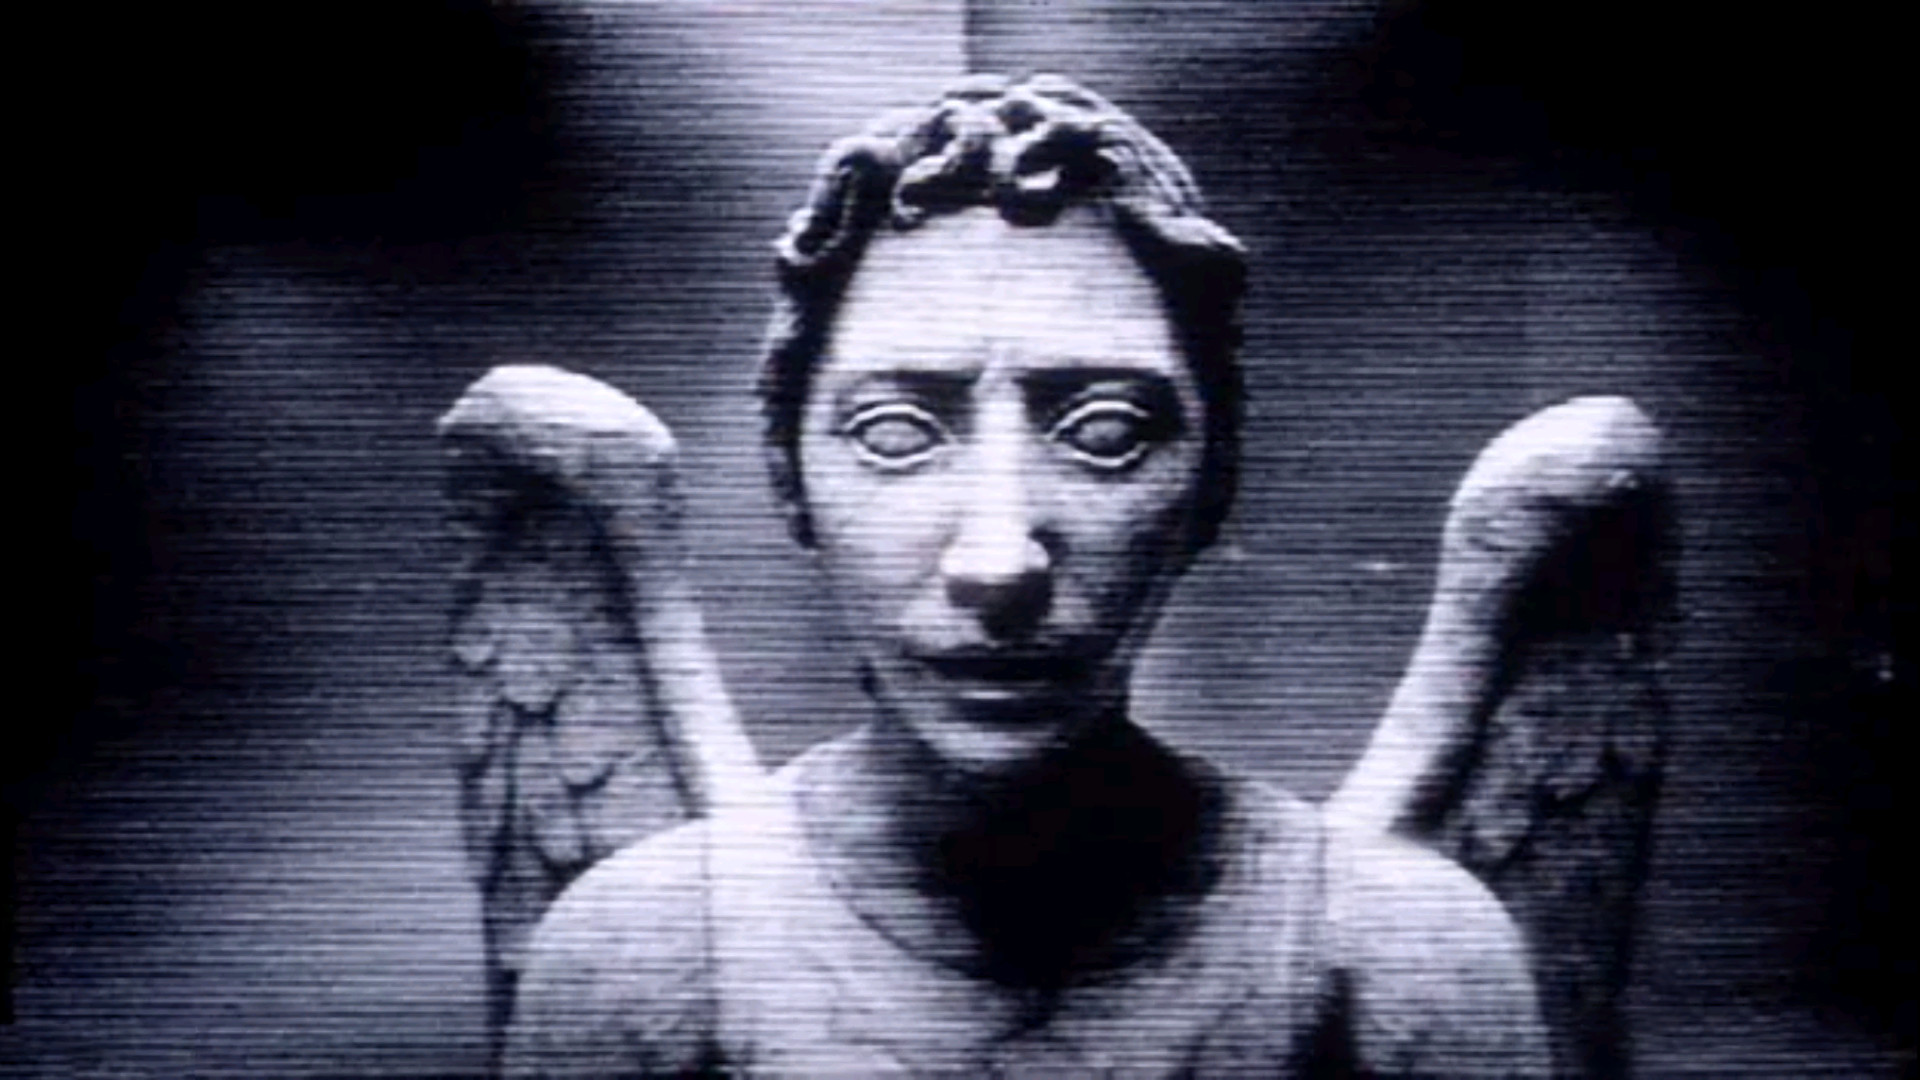 Dark Angel Gothic Angels Demon Demons Fantasy Wallpaper At Dark Wallpapers